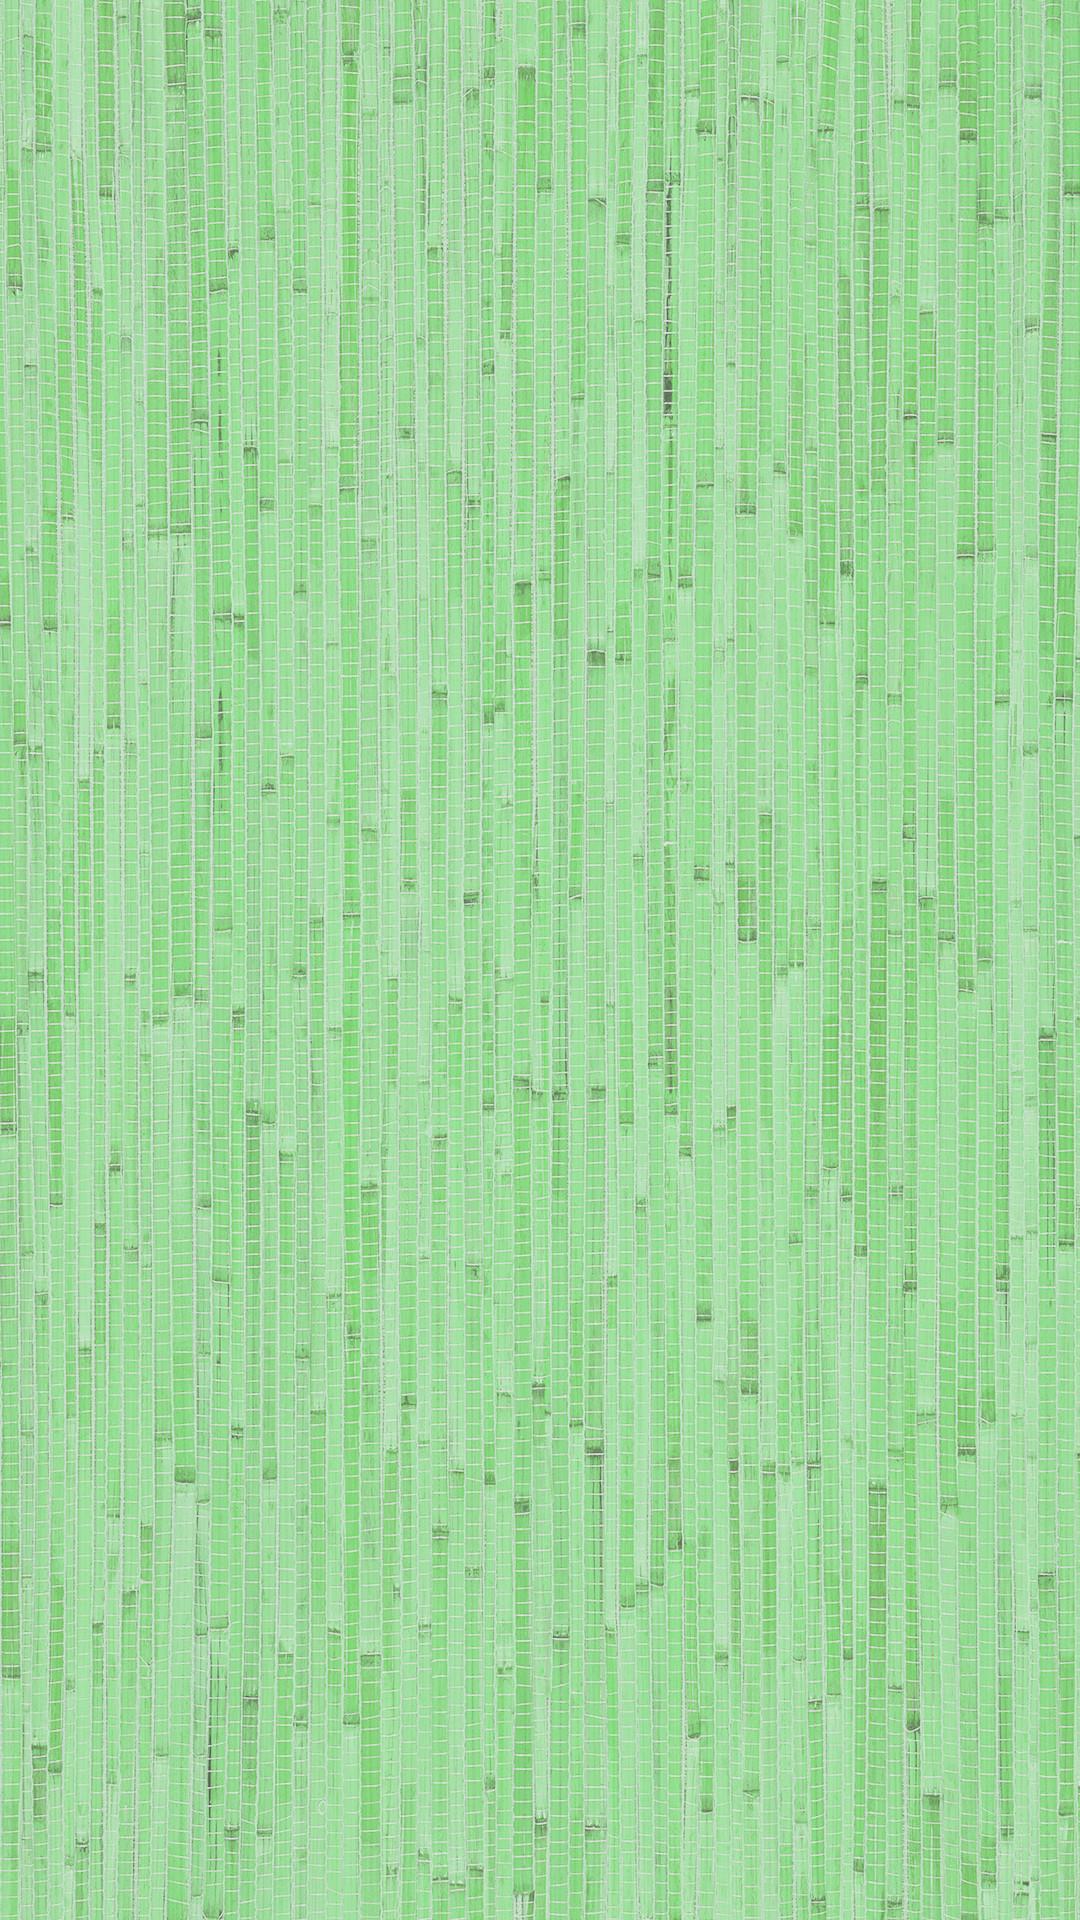 Pattern Wood Grain Gray Wallpapersc Iphone7plus .